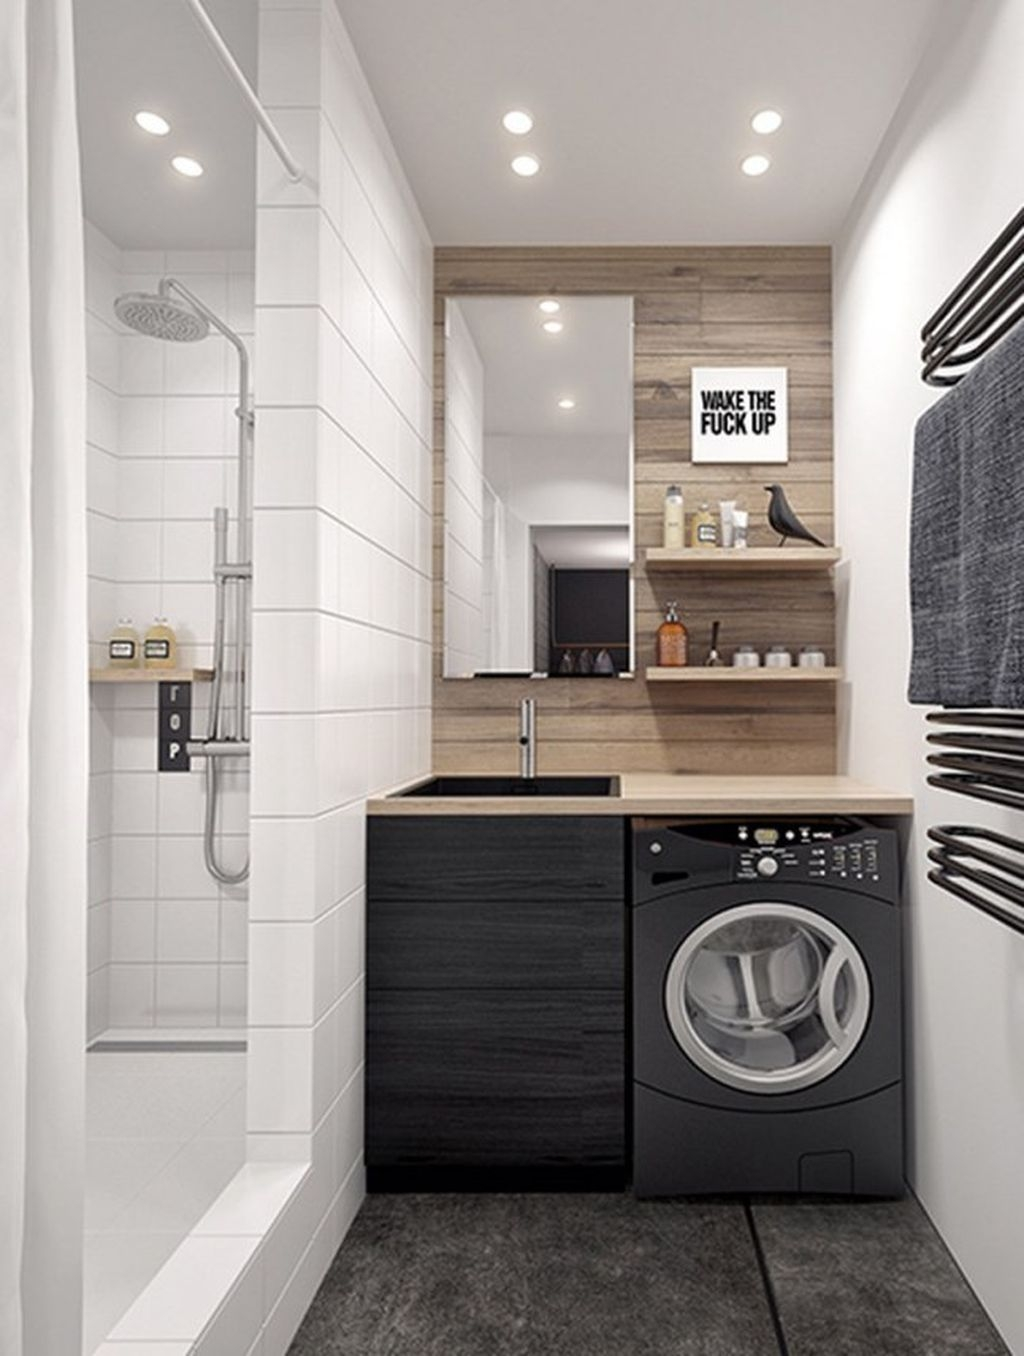 Brilliant Small Apartment Decoration Ideas On A Budget 19